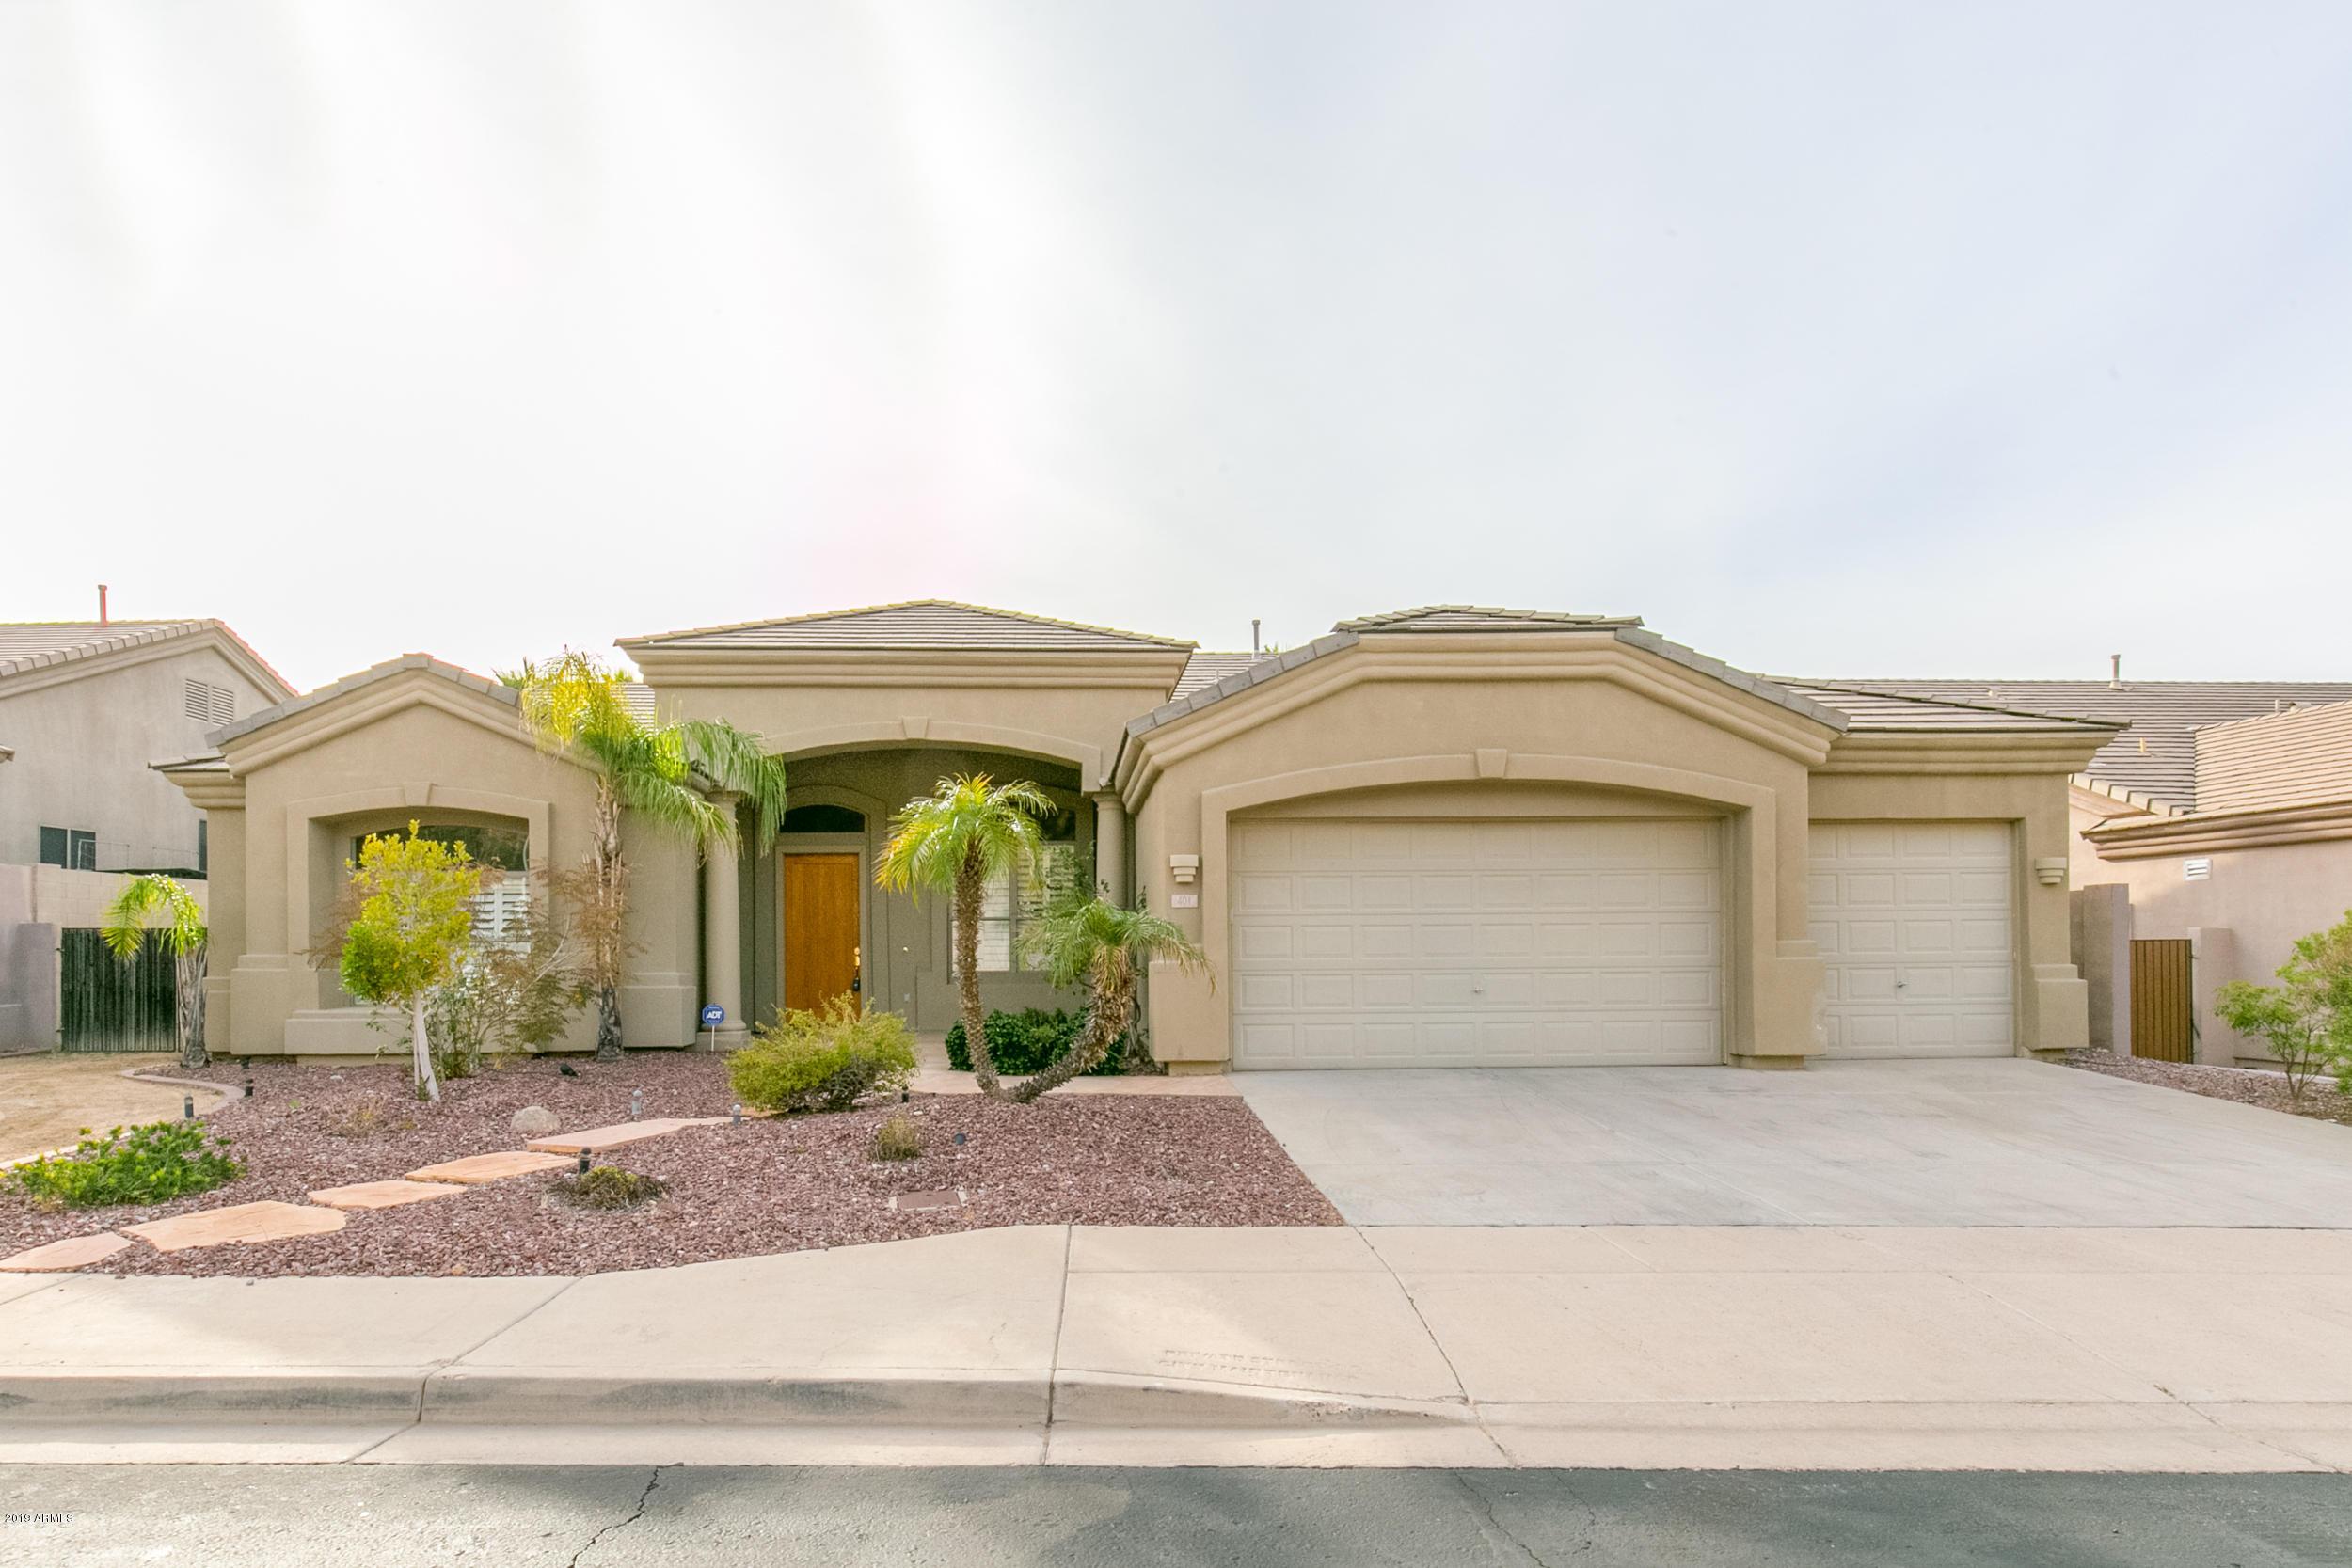 Photo of 401 W Desert Flower Lane, Phoenix, AZ 85045